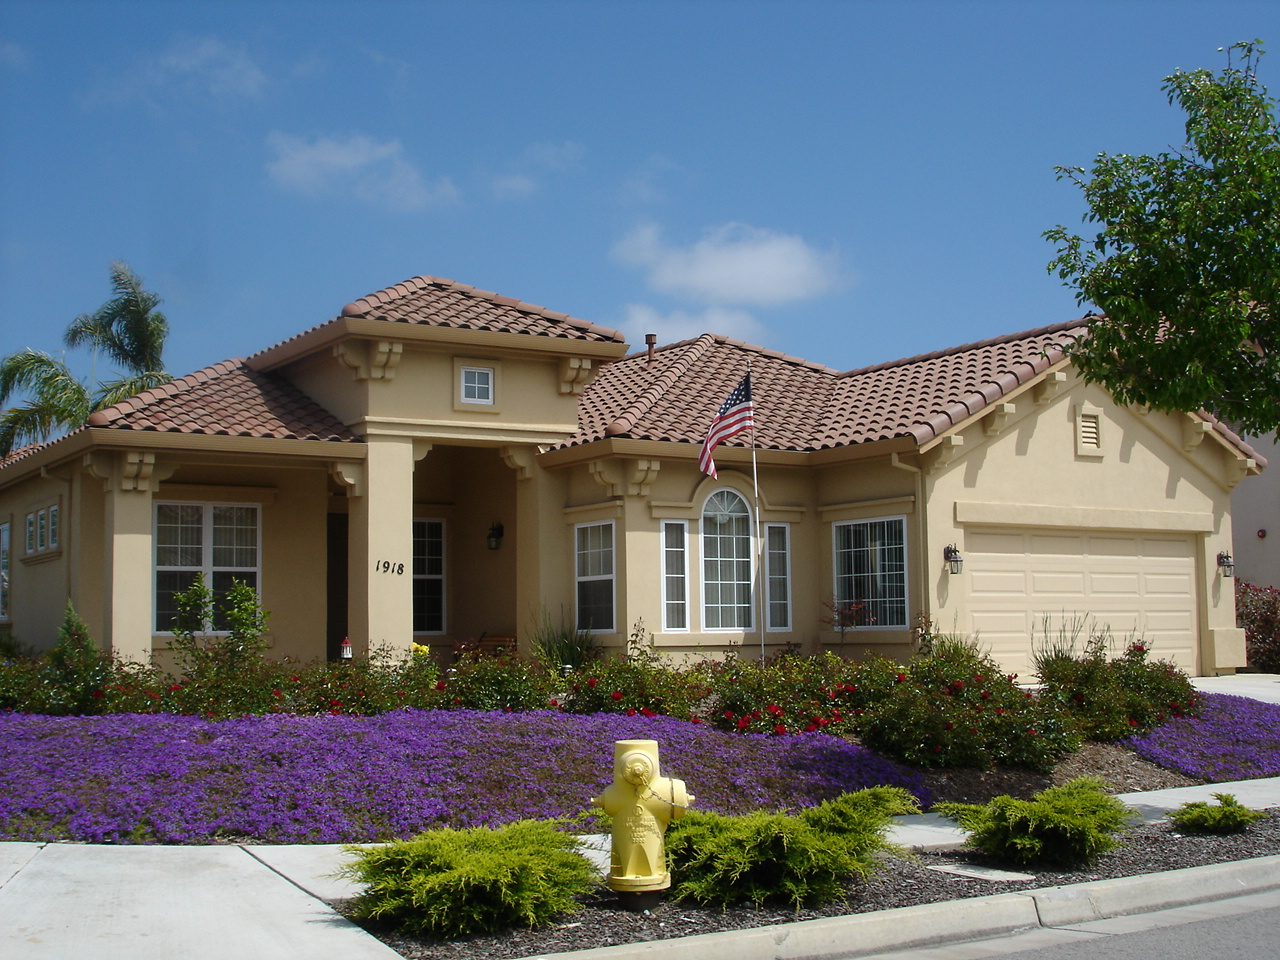 Ranch_style_home_in_Salinas__California.JPG